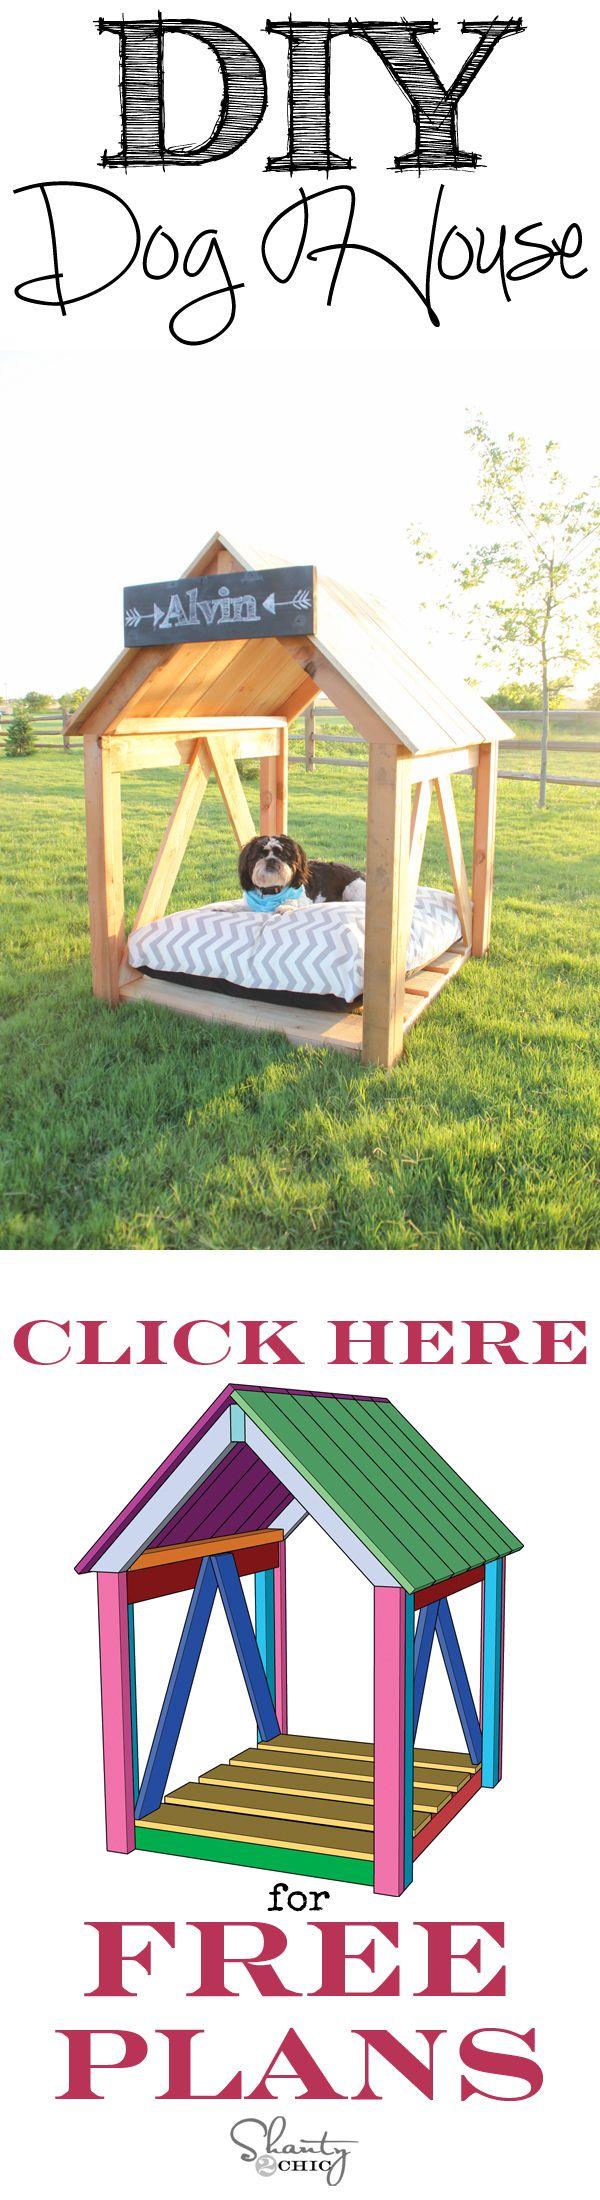 Diy Dog House Diy Dog Stuff Dog House Diy Dog House